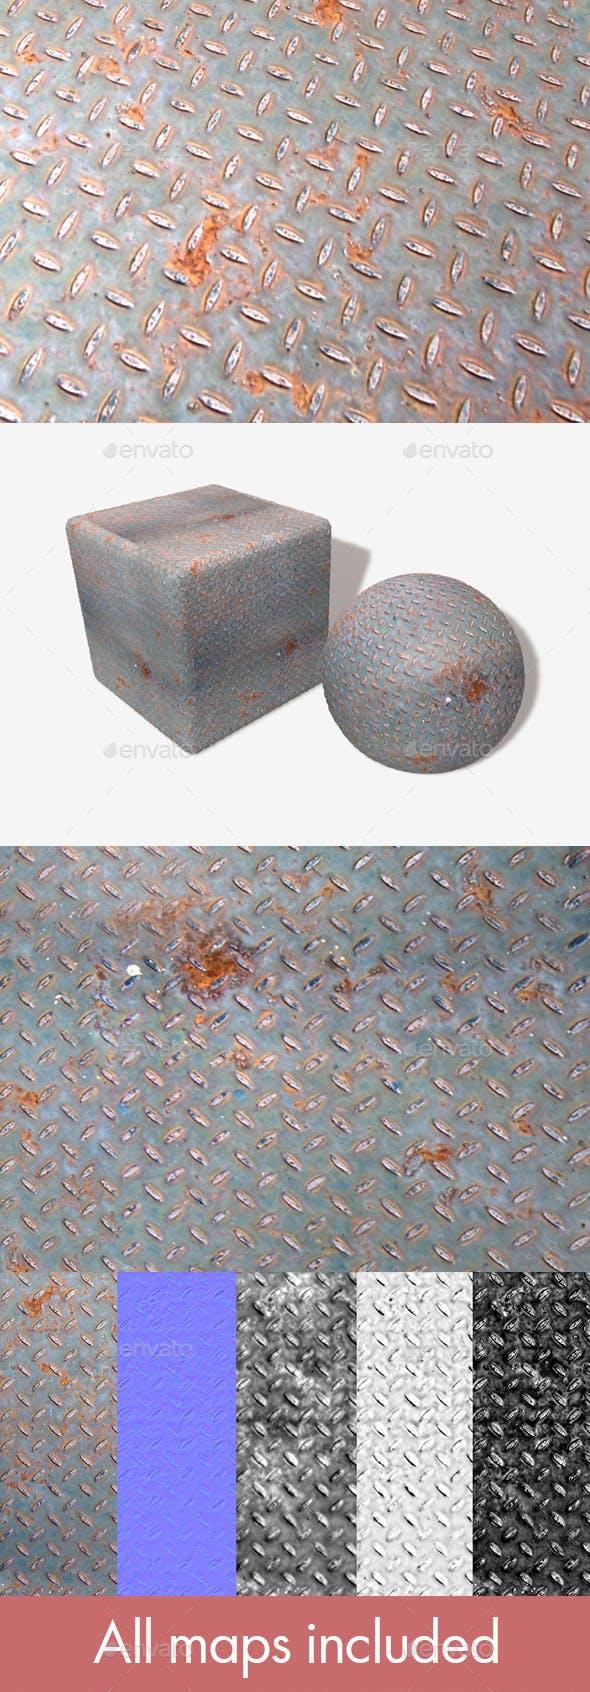 Rusty Metal Grid Seamless Texture - 3DOcean Item for Sale